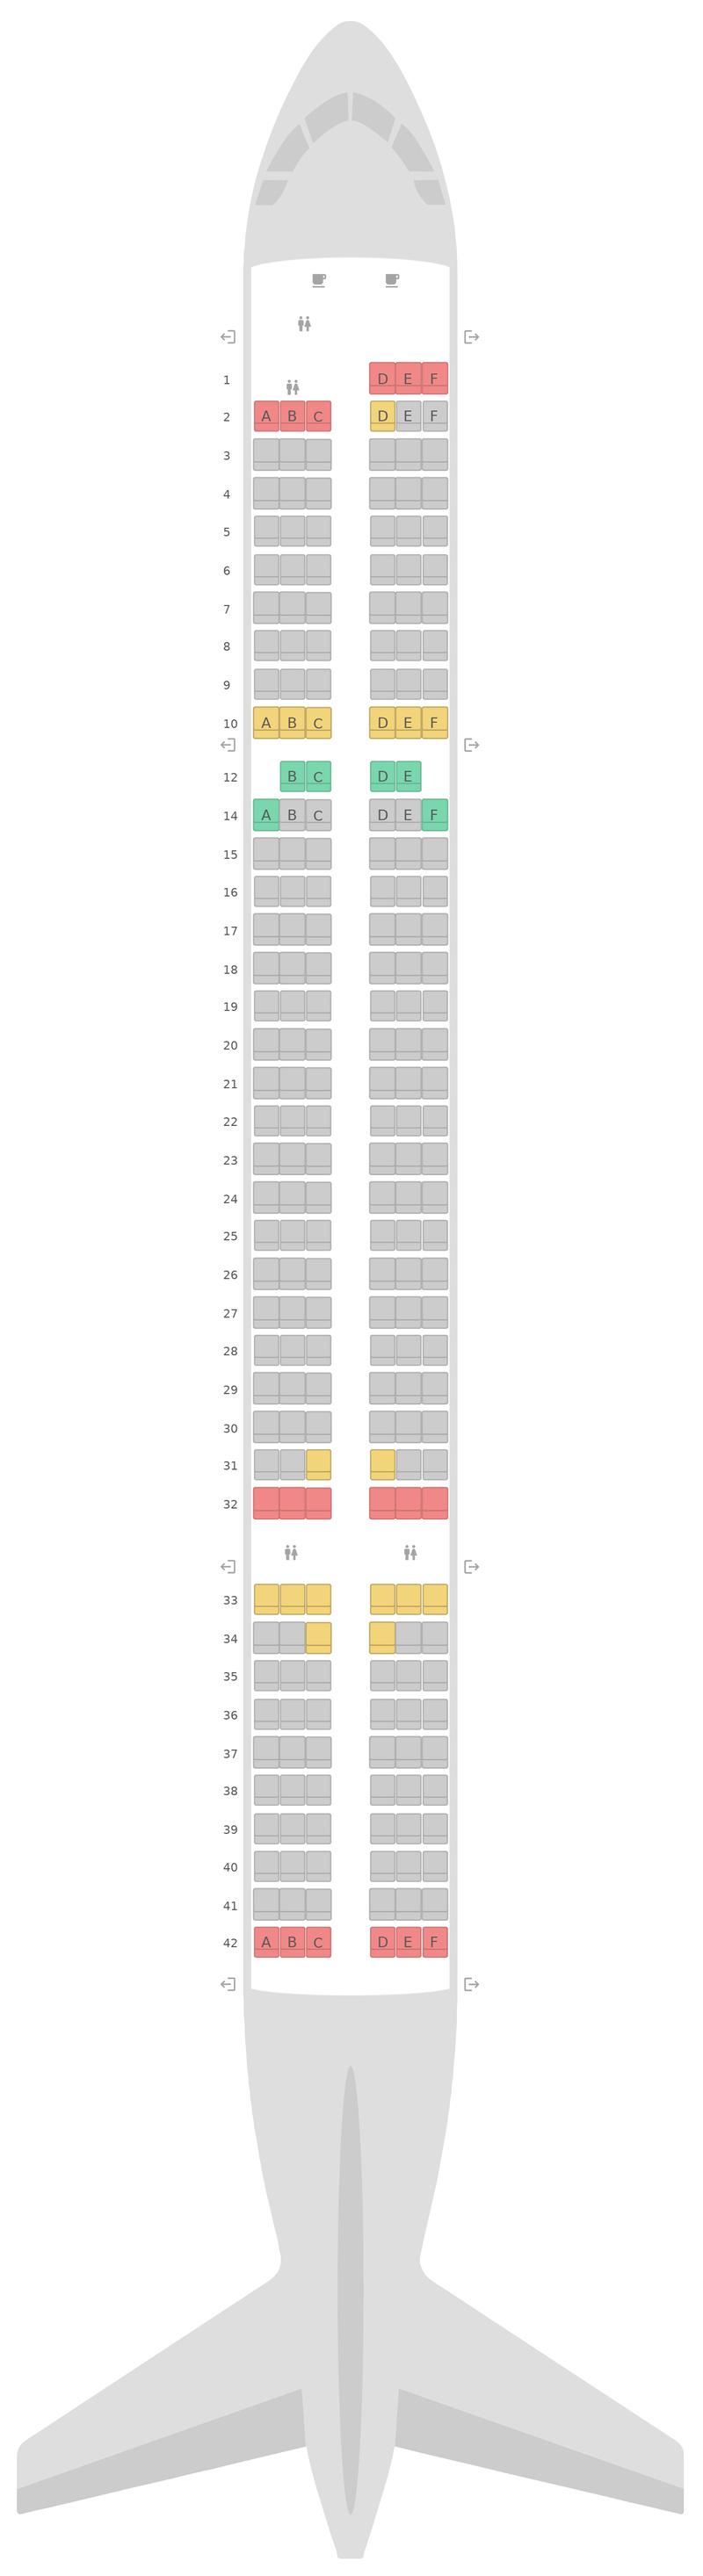 Схема салона Боинг 757-200 (752) Jet2.com